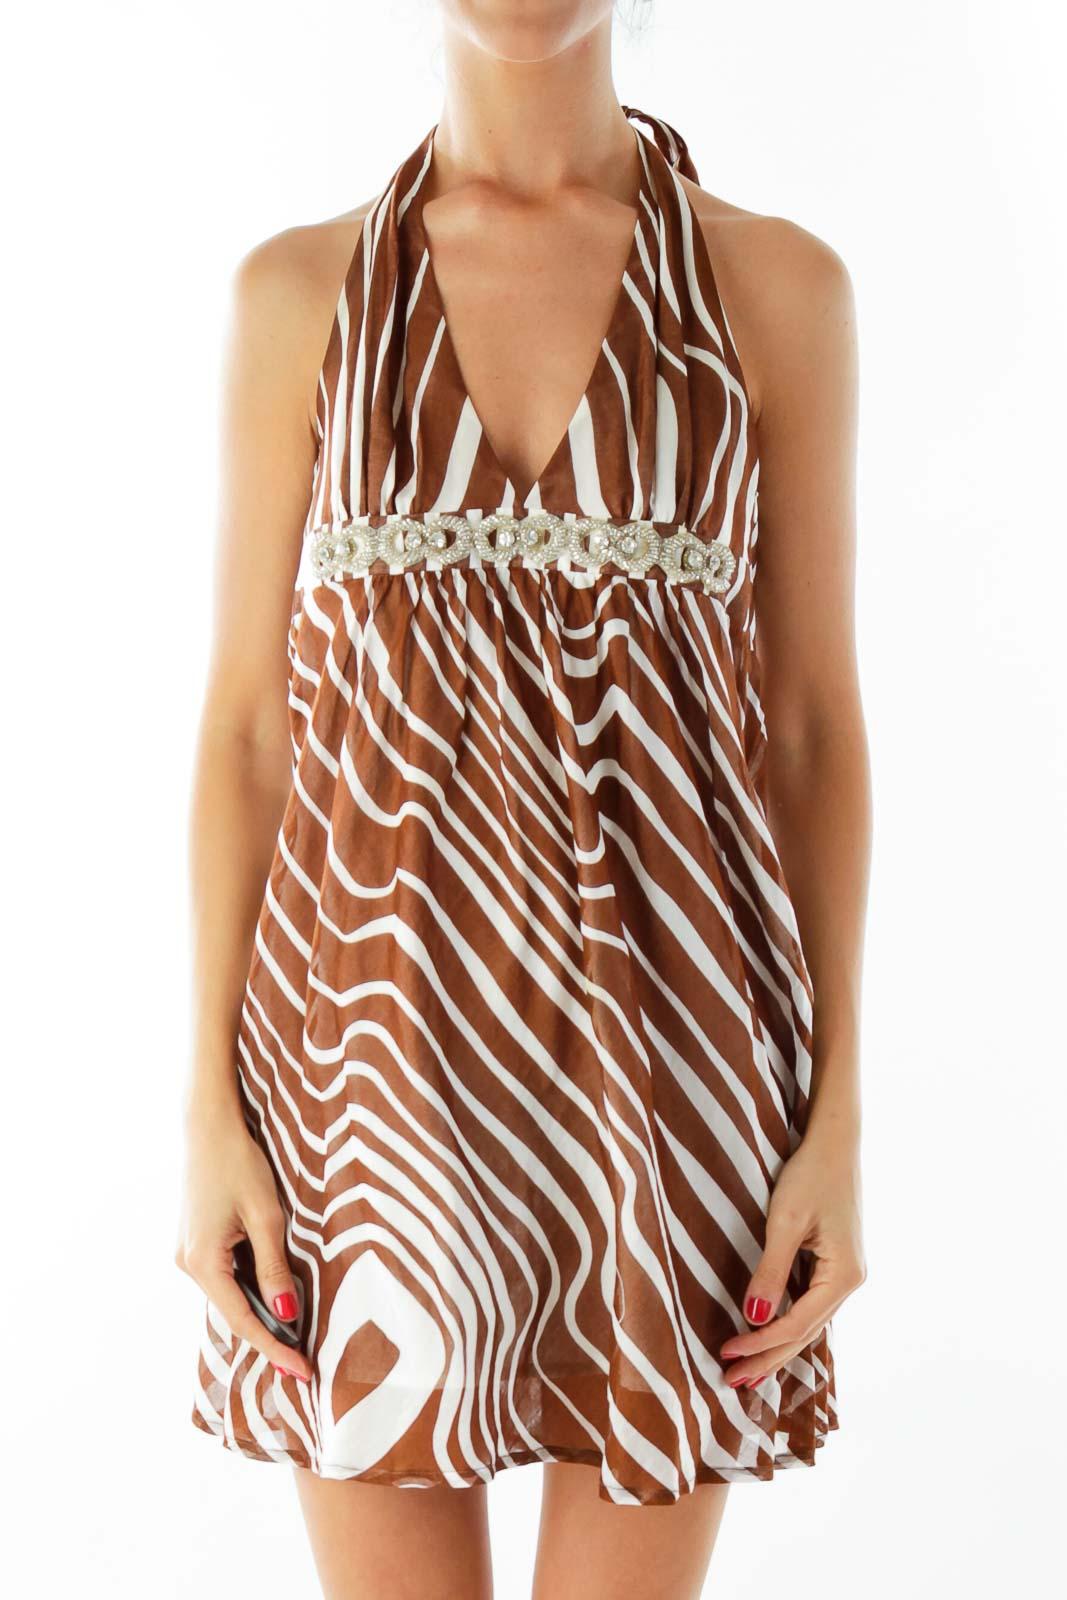 Brown Creme Zebra Print Halter Dress